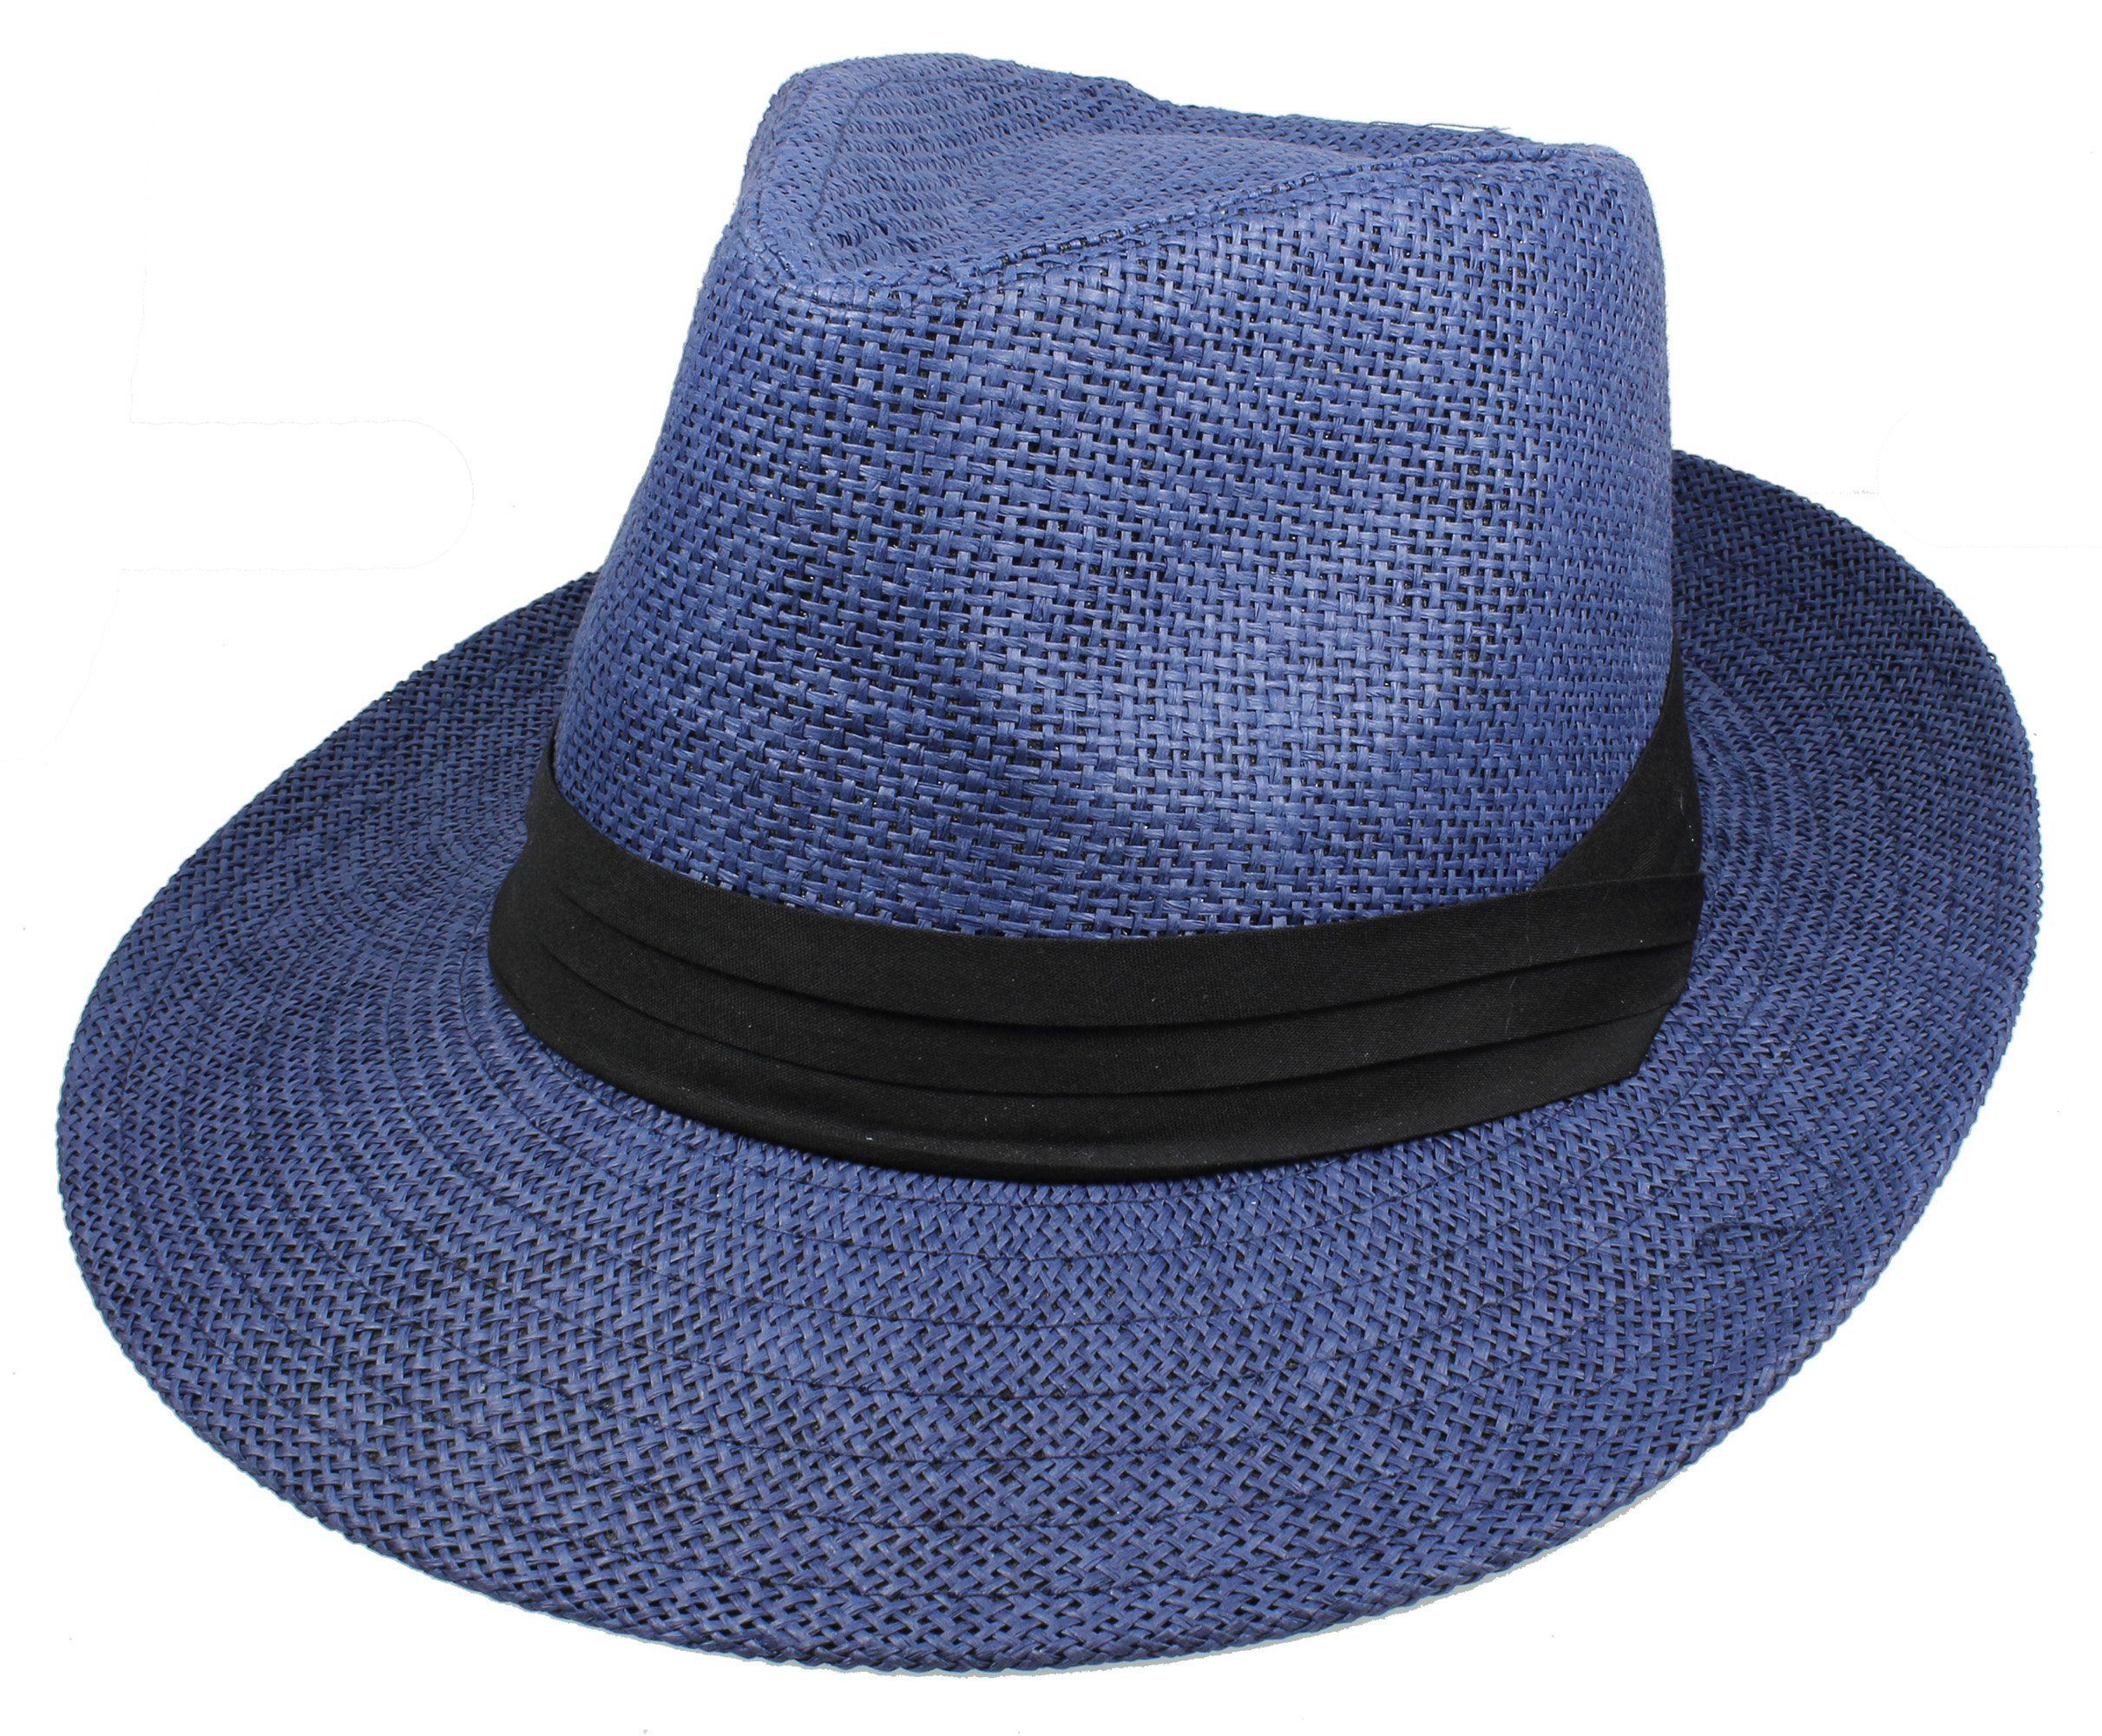 Gelante Wide Brim Summer Fedora Panama Straw Hats with Black Band M255-Navy-S/M